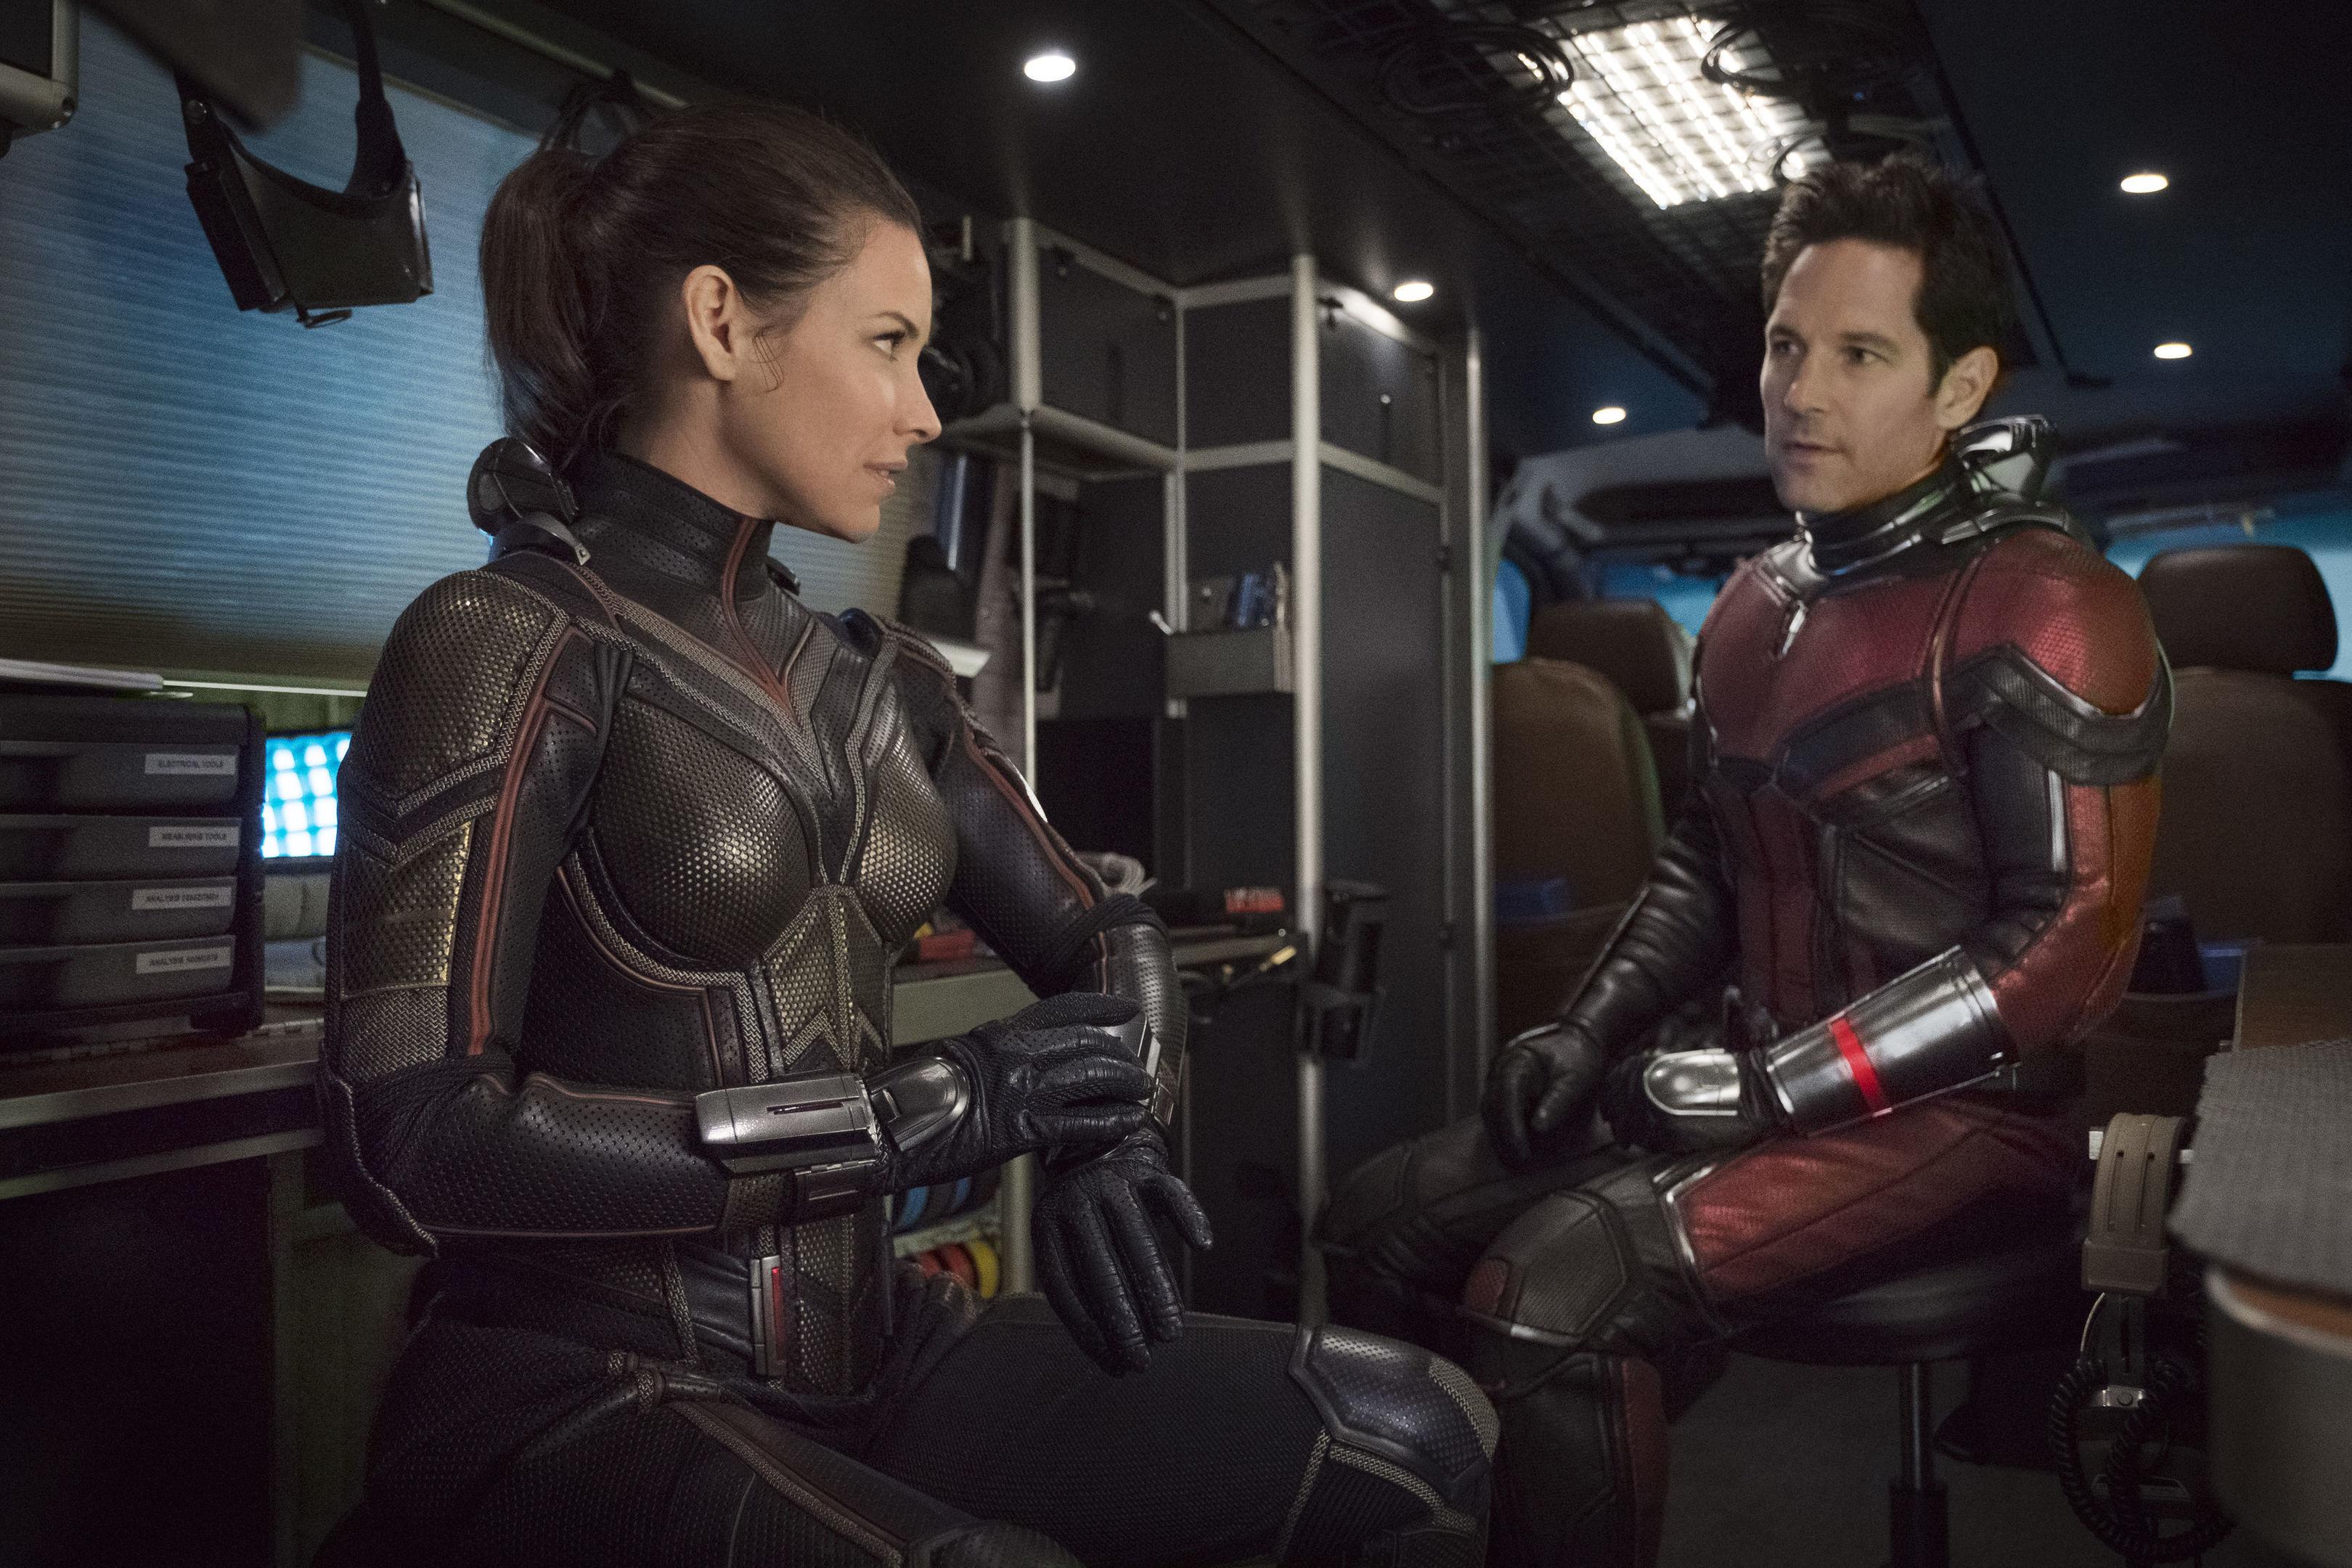 Evangeline Lilly as Hope van Dyne/The Wasp and Paul Rudd as Scott Lang/Ant-Man (PA Photo/Marvel Studios/Ben Rothstein)